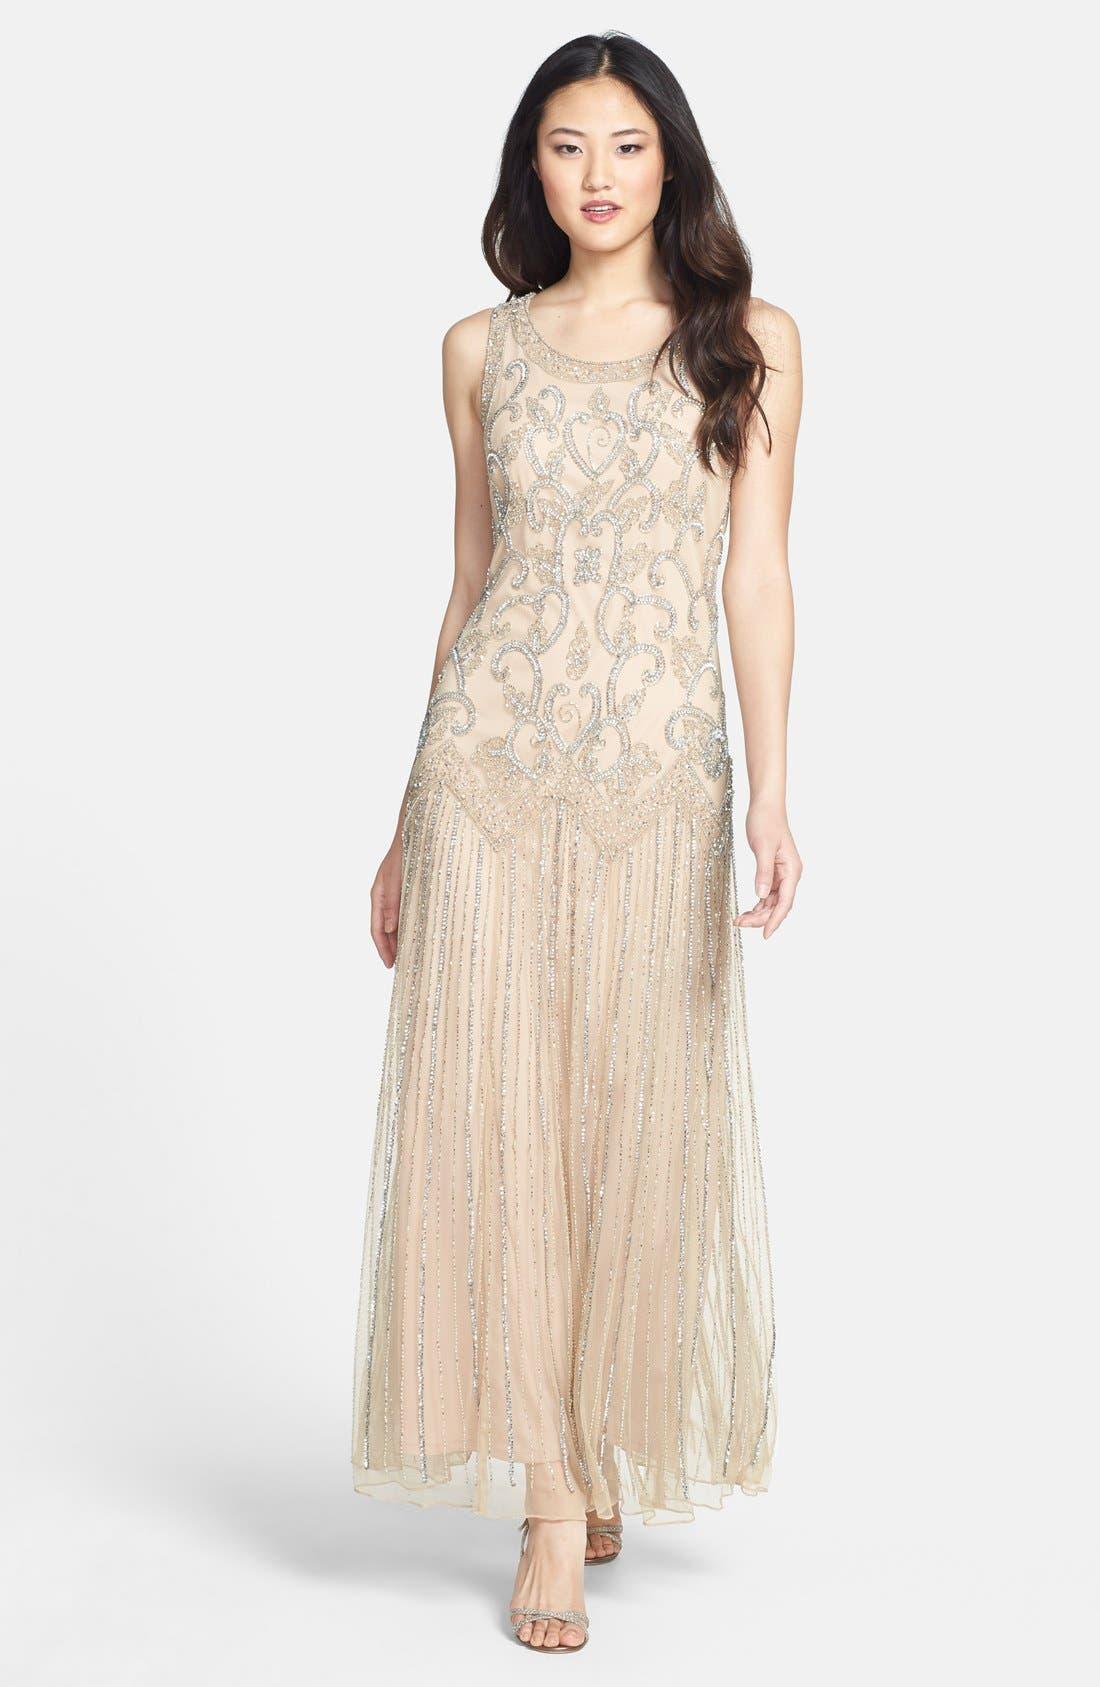 Main Image - Pisarro Nights Embellished Mesh Dress (Regular & Petite)